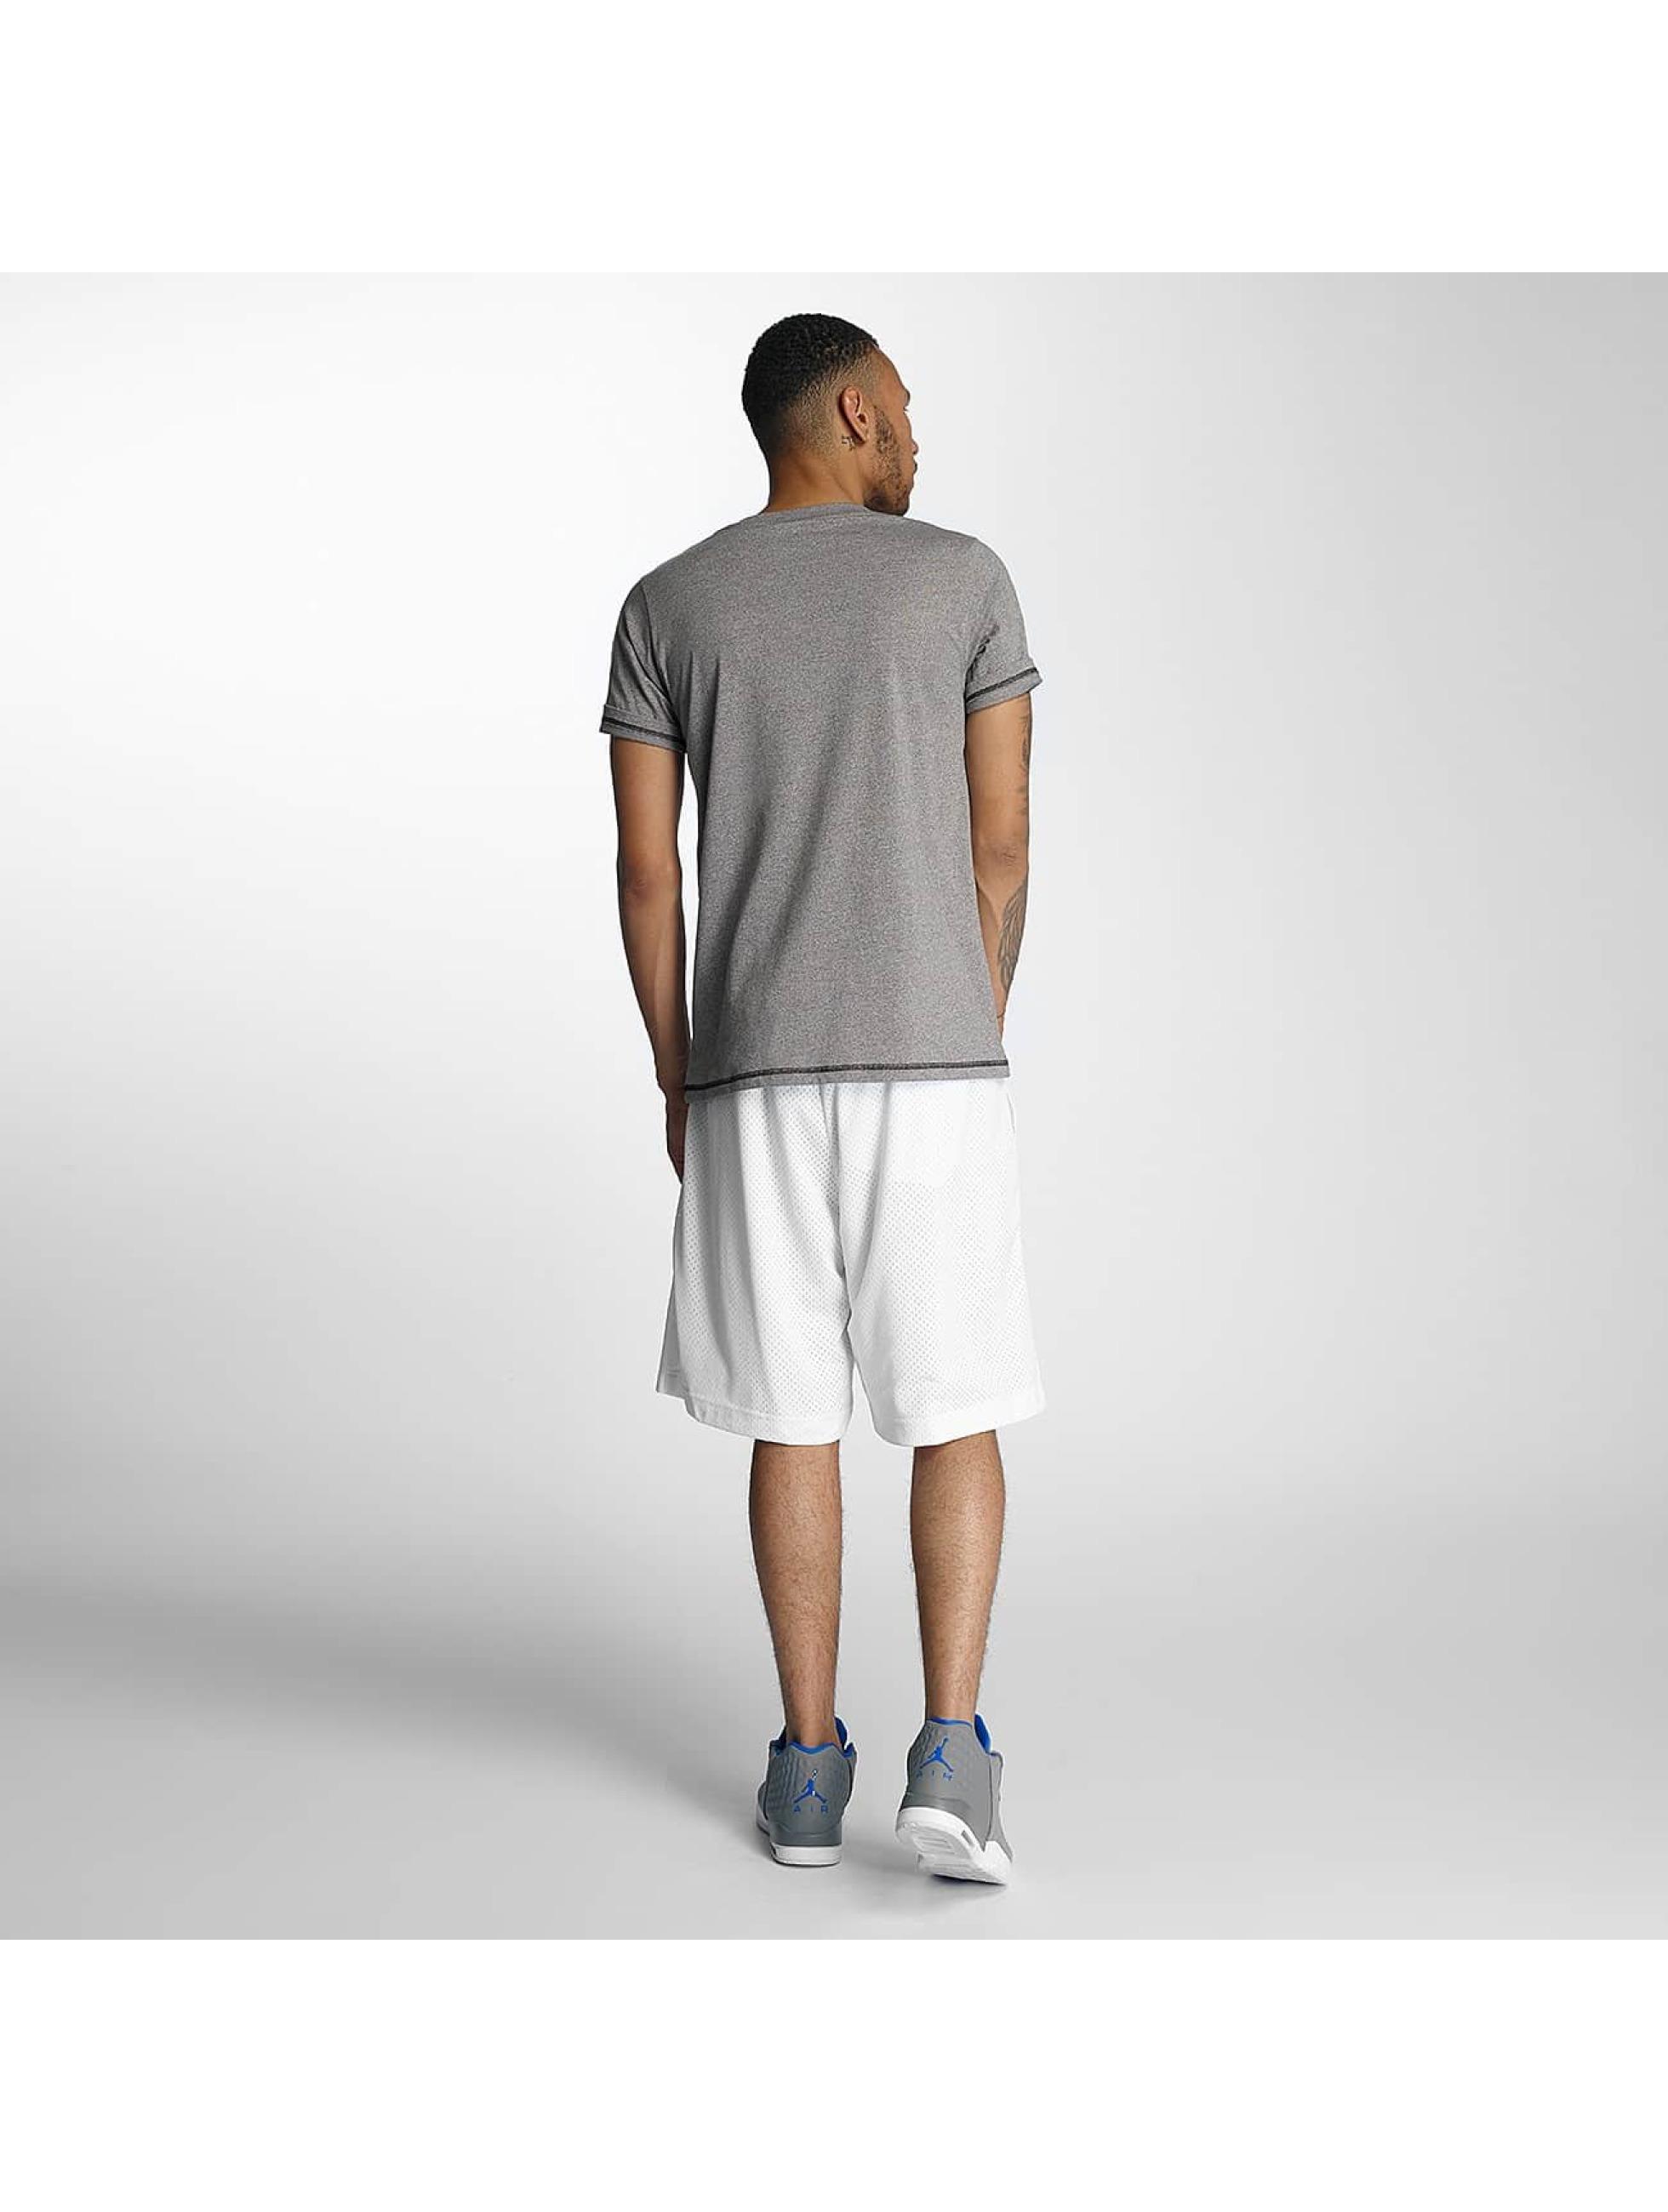 Wrung Division T-Shirt Just Do Art gray